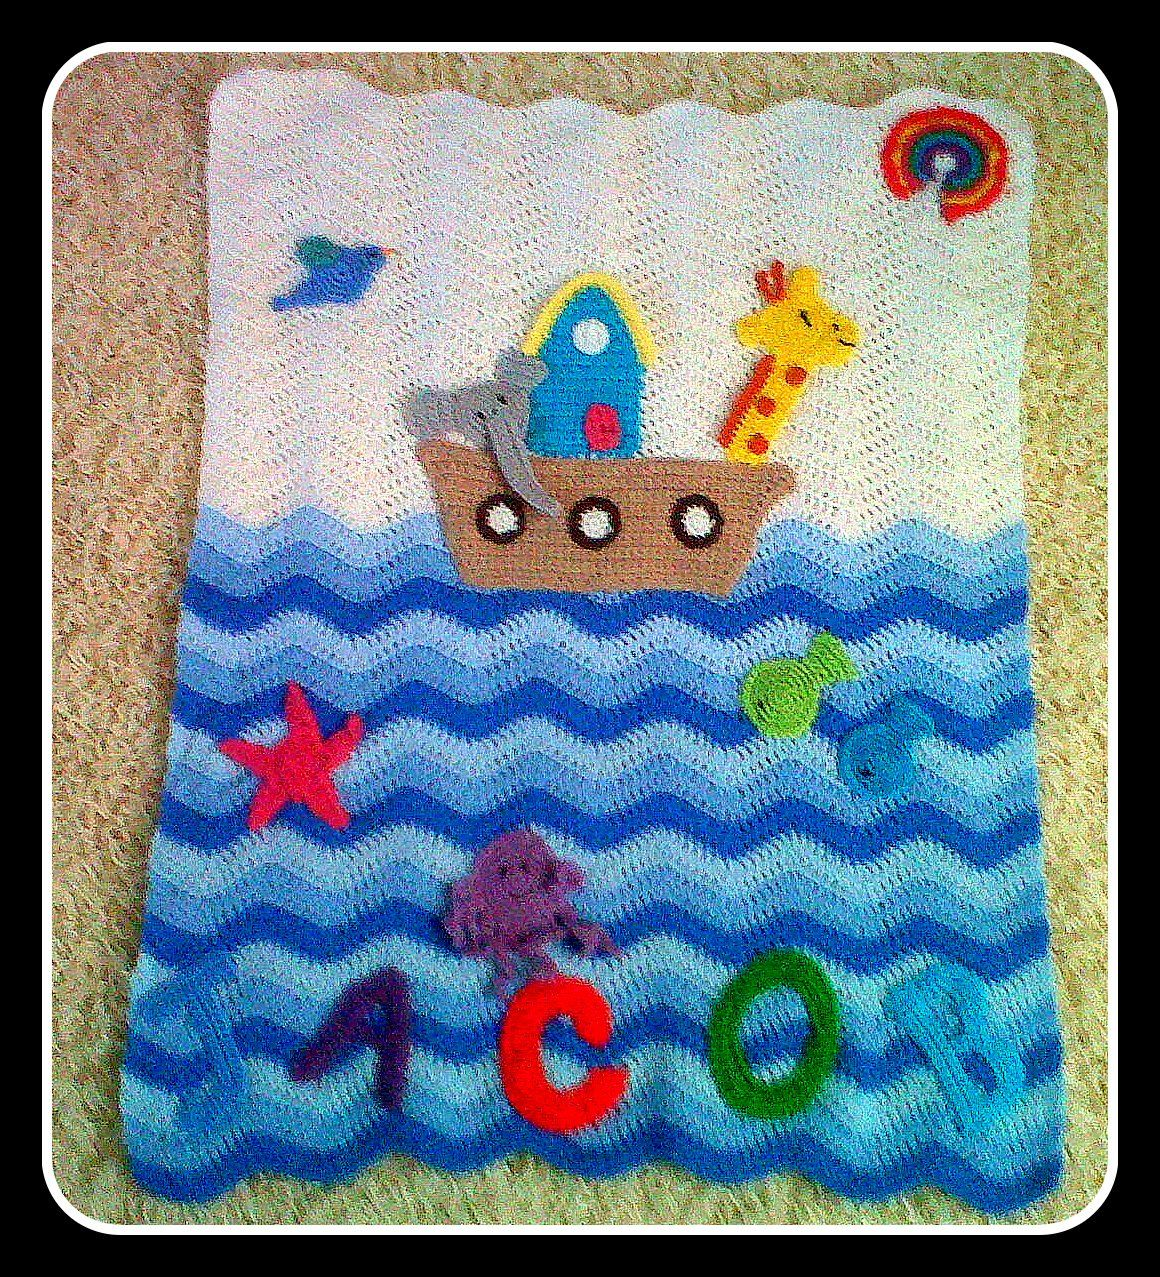 mandas challenges     nice sea blanket